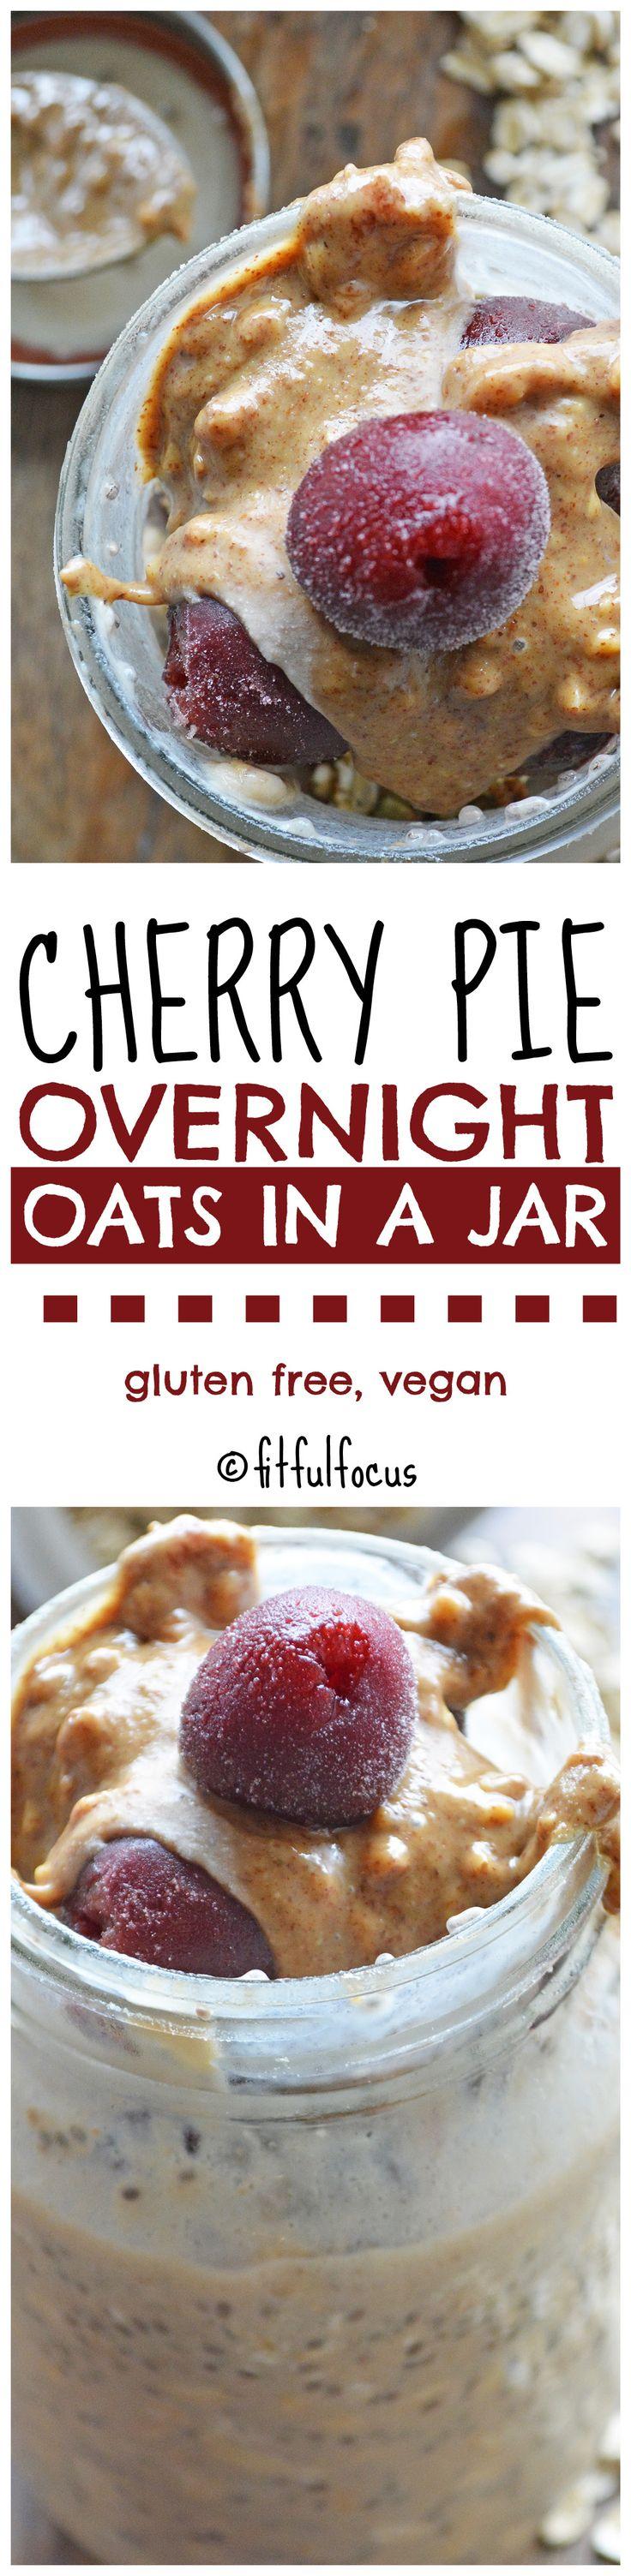 Cherry Pie Overnight Oats in a Jar | Healthy Breakfast Recipes | Gluten Free | Vegan | Dessert for Breakfast | Cherries | Cherry Oatmeal | Meatless Monday